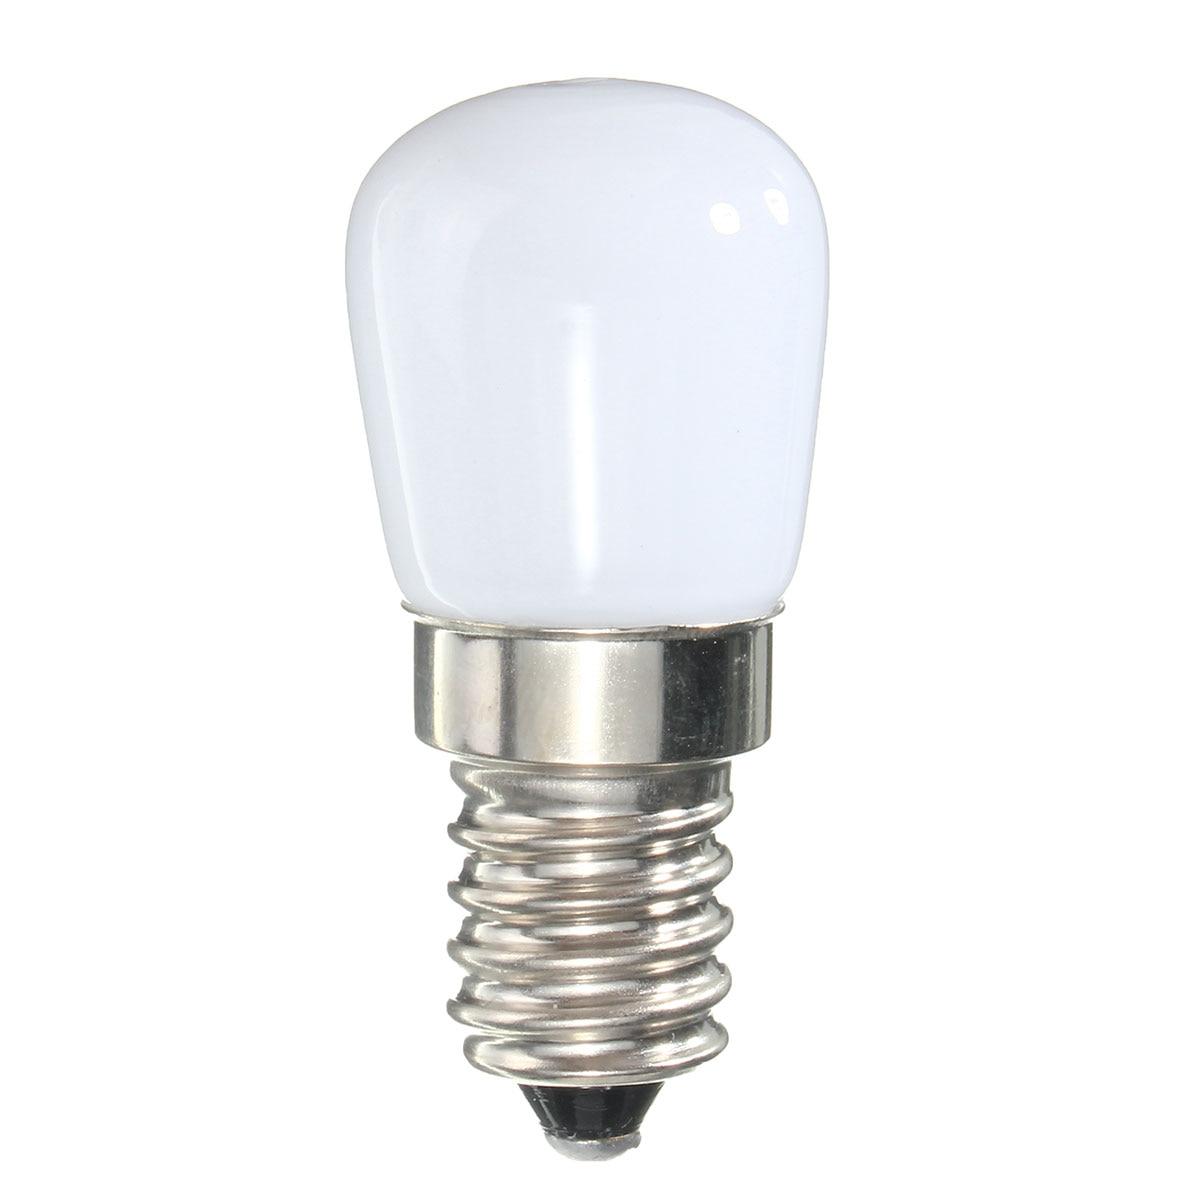 220V Mini E14 COB LED Light Blub 2835 SMD Glass Lamp for Refrigerator Fridge Freezer Sewing Machine Home Lighting